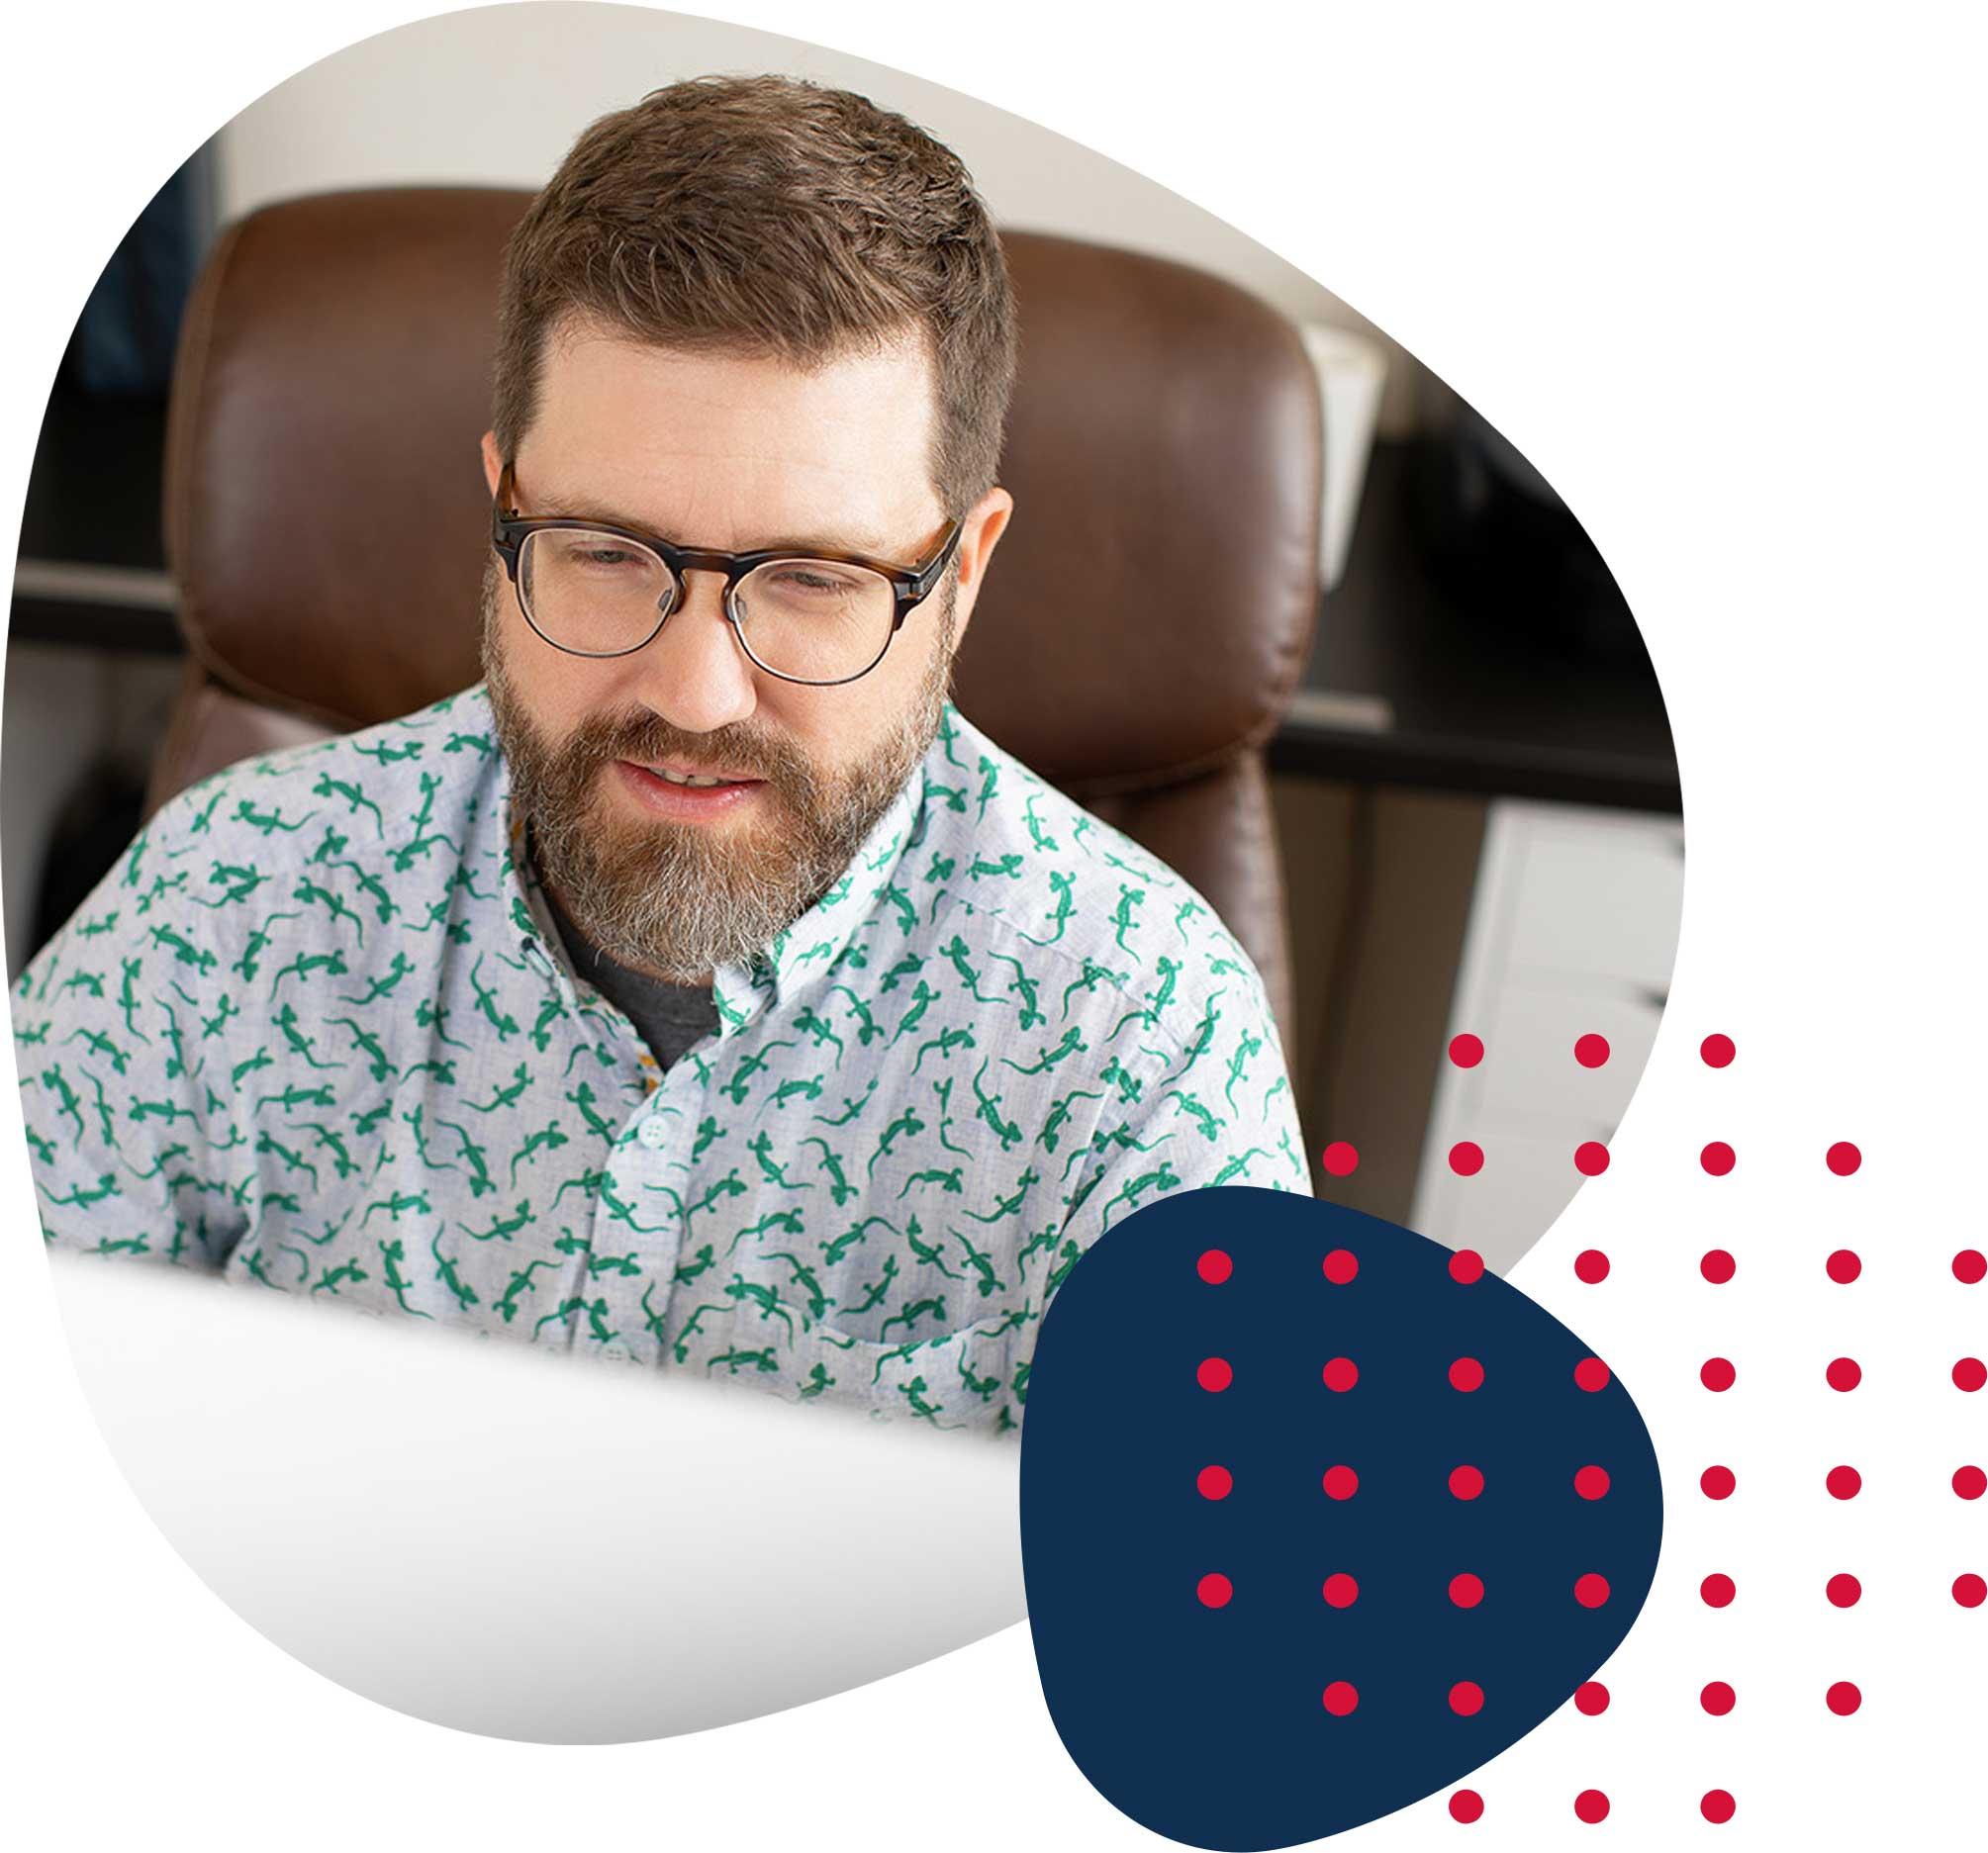 Tim Ellis, CEO & Founder, Graphic Designer, Web Developer, Marketing Consultant for small businesses.